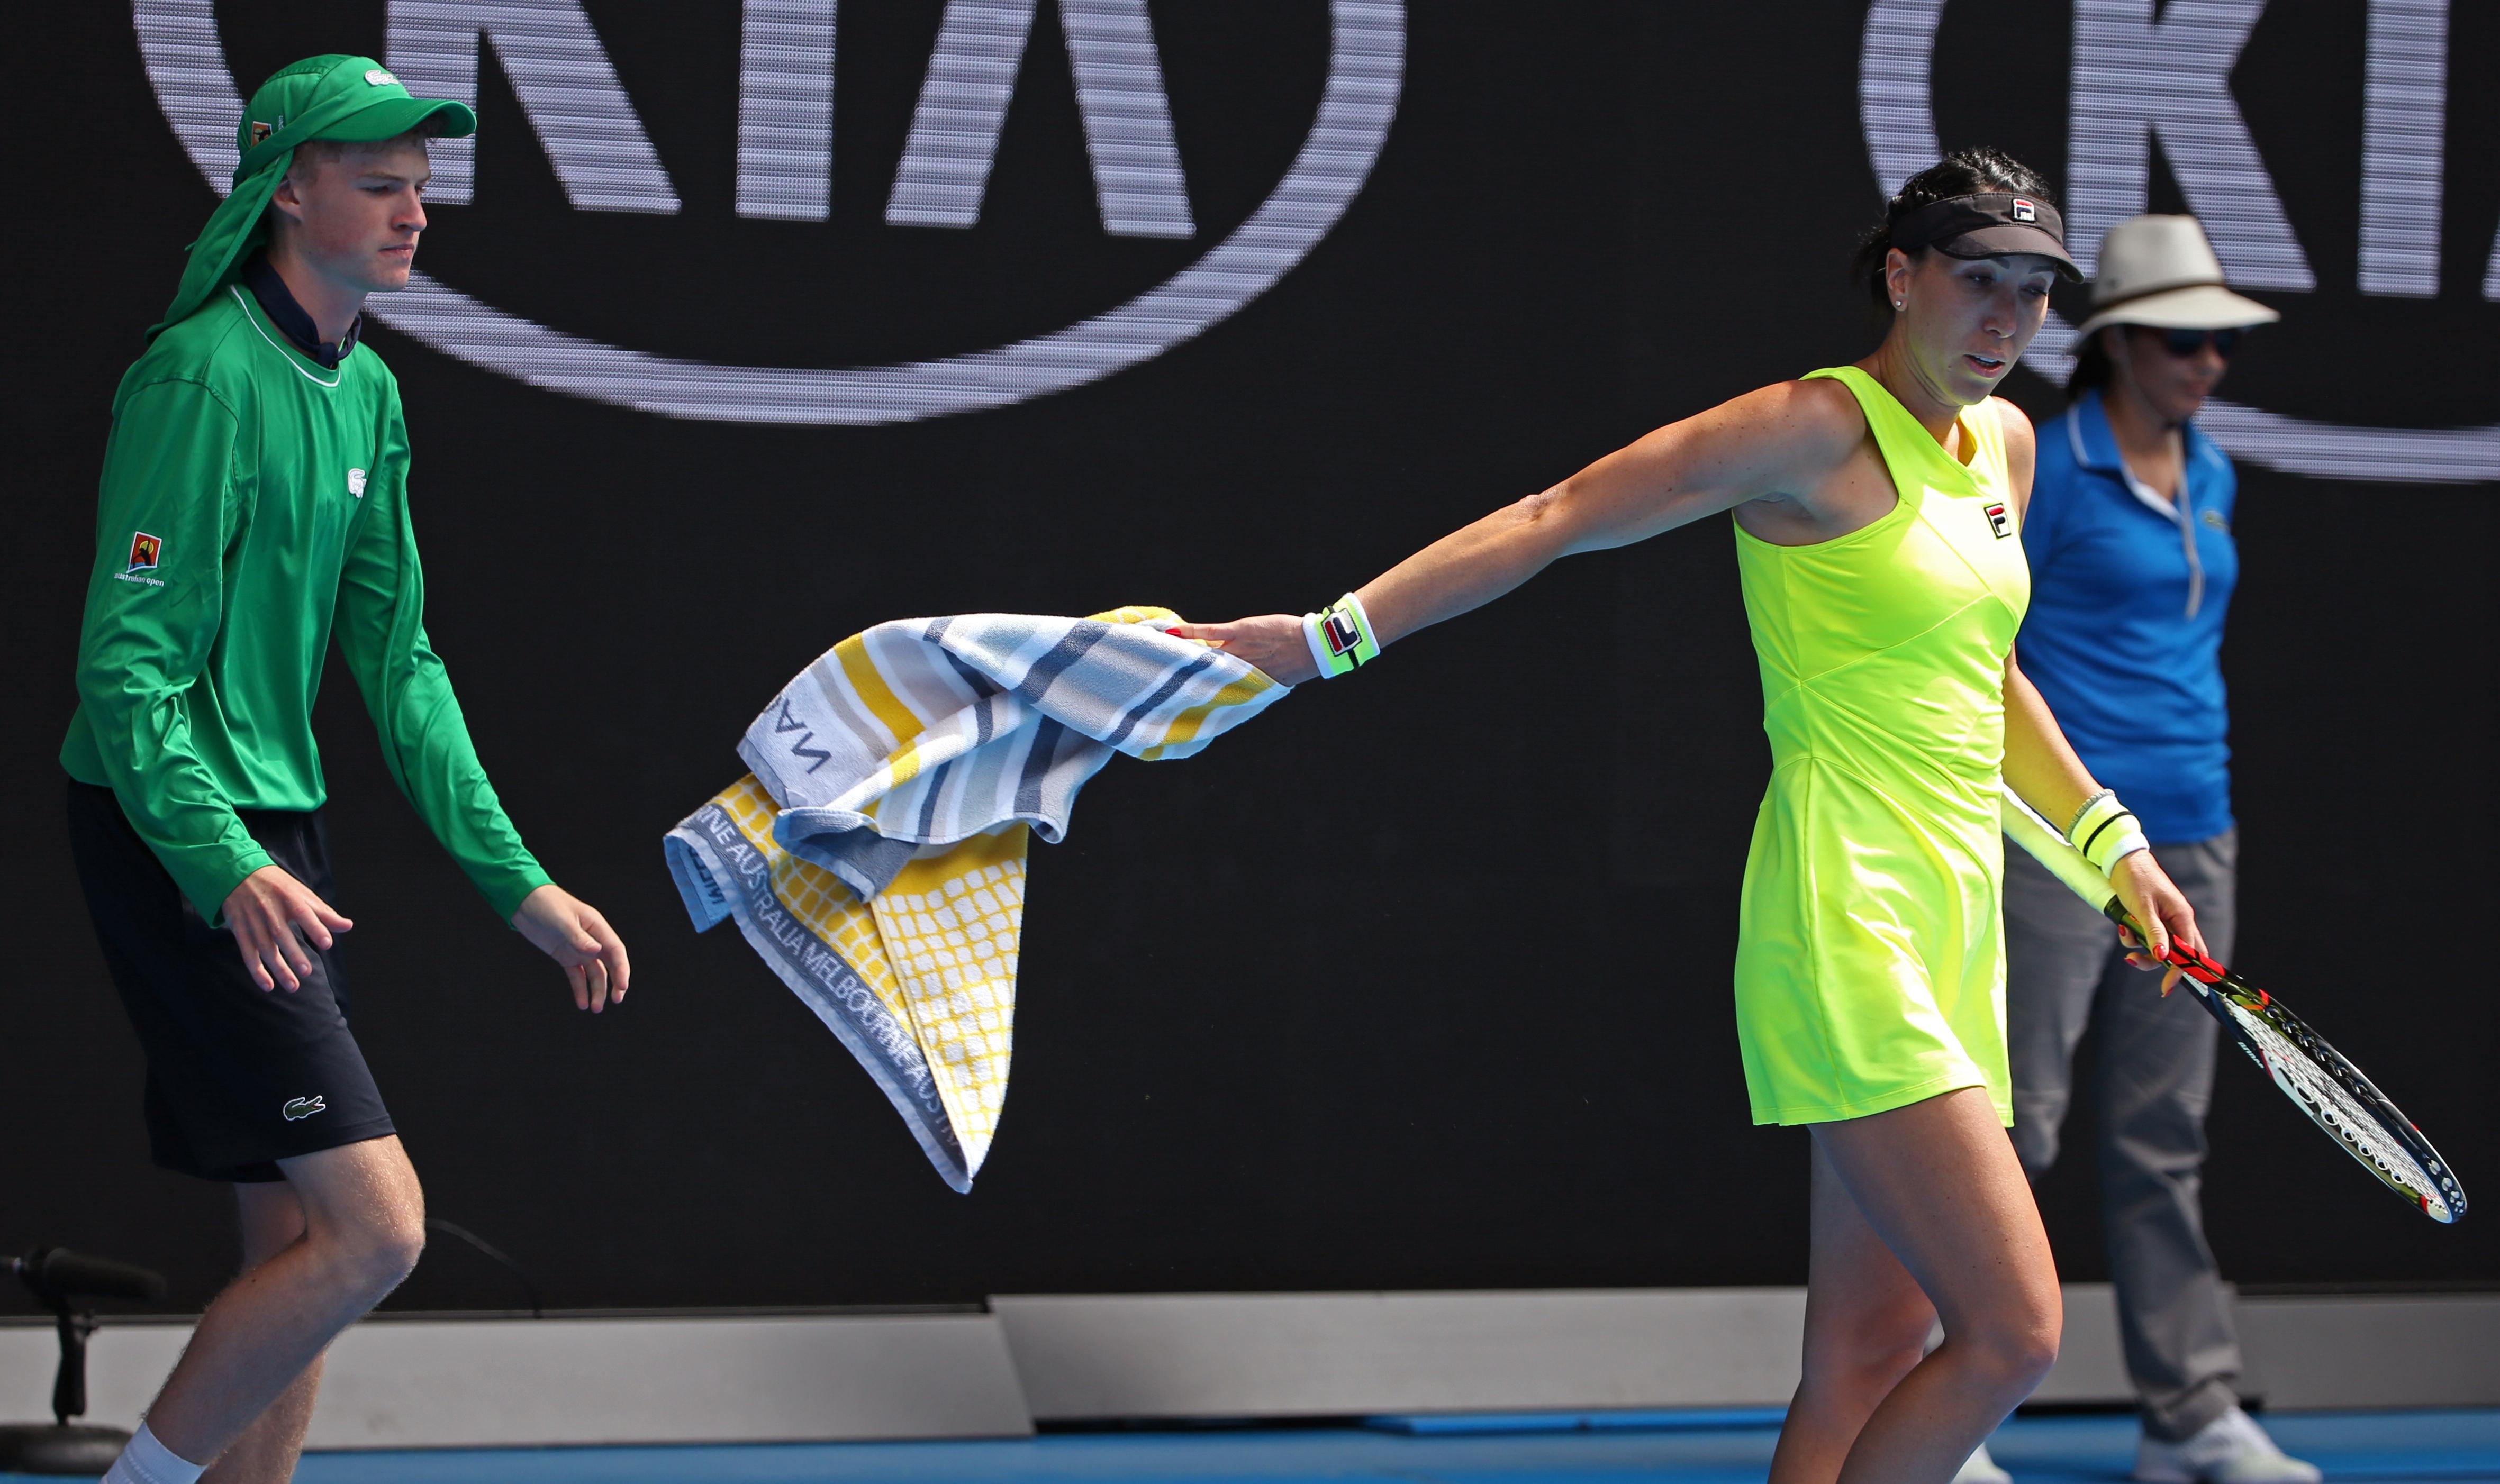 australian_open_tennis-ad73e4842c284f968_r3453.jpeg